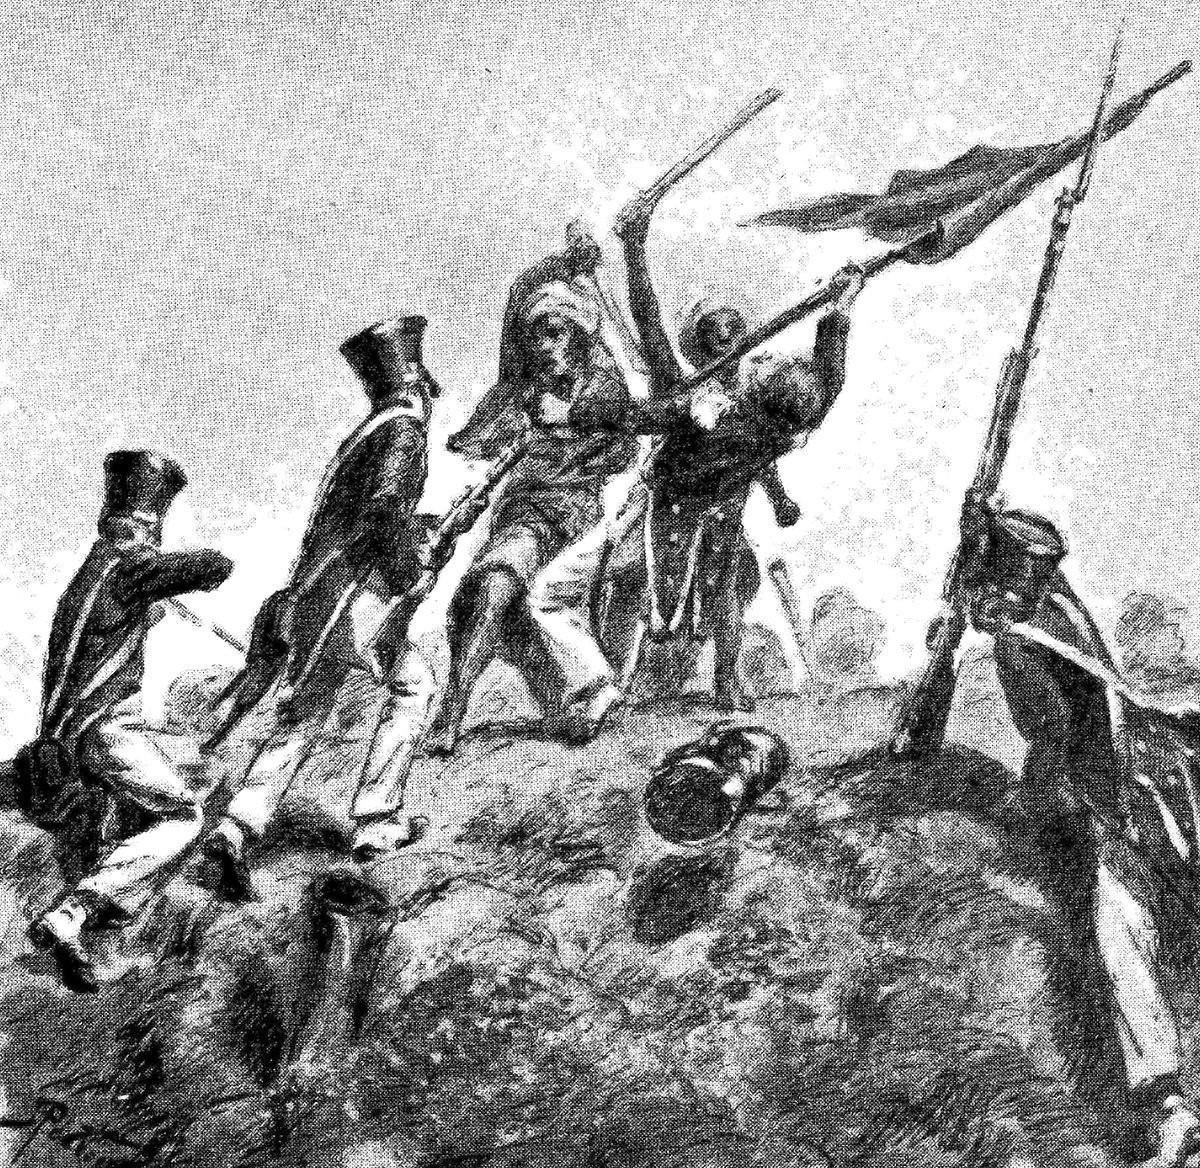 Sejarah Kekerasan Di Minangkabau Bahasa